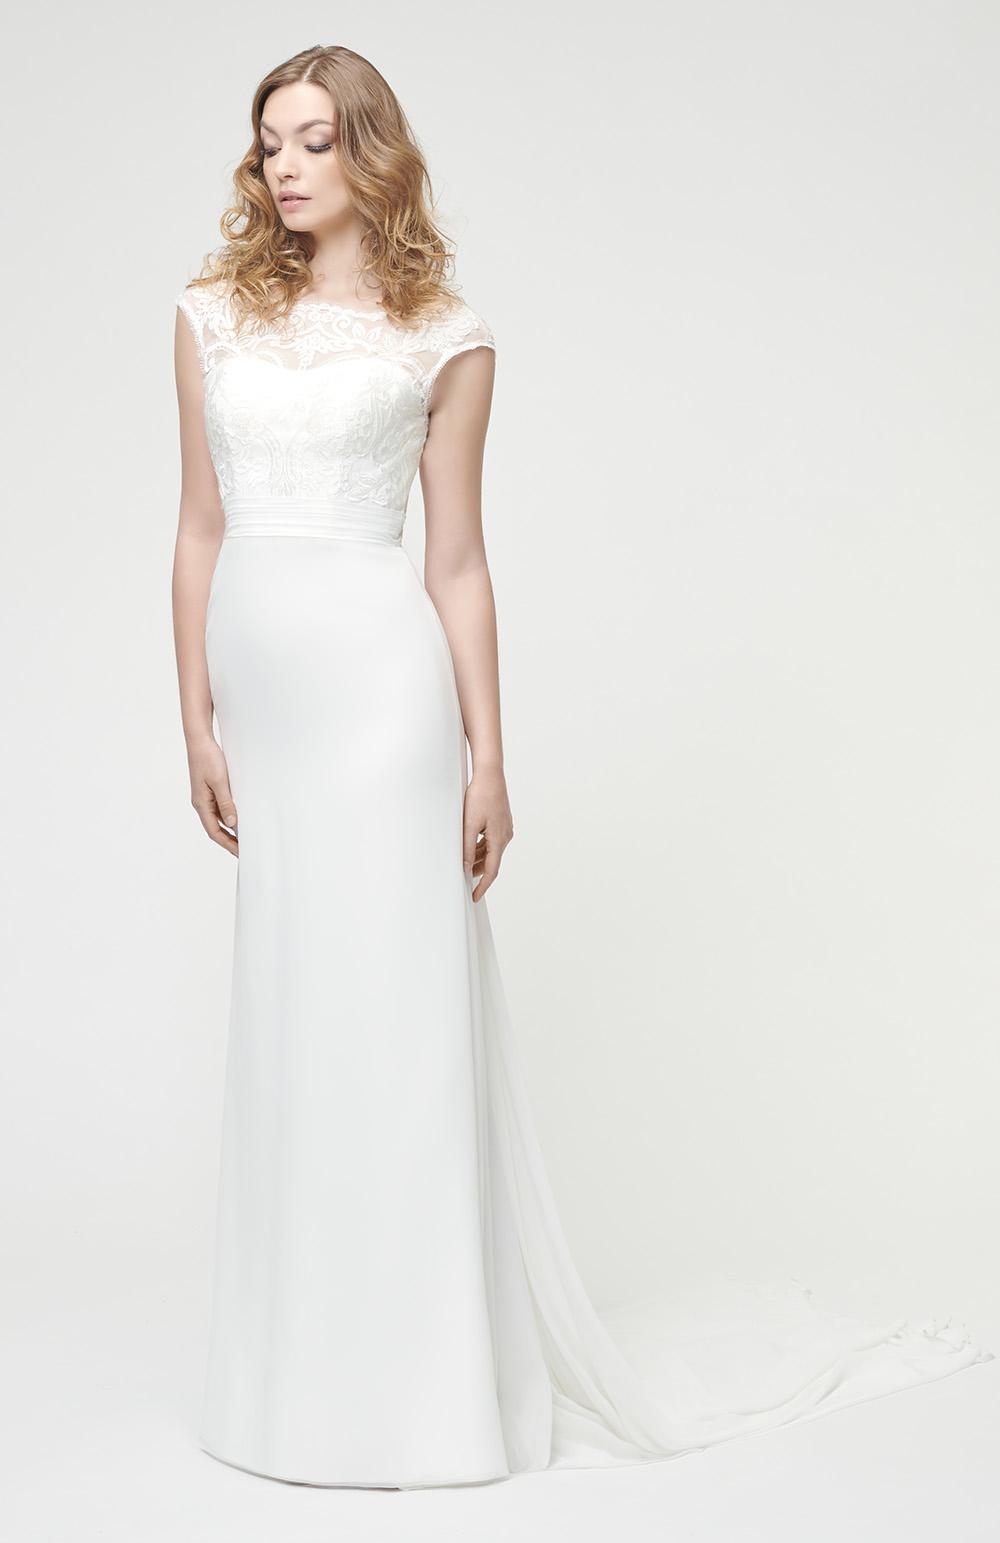 Robe de mariée Modèle Rosalia